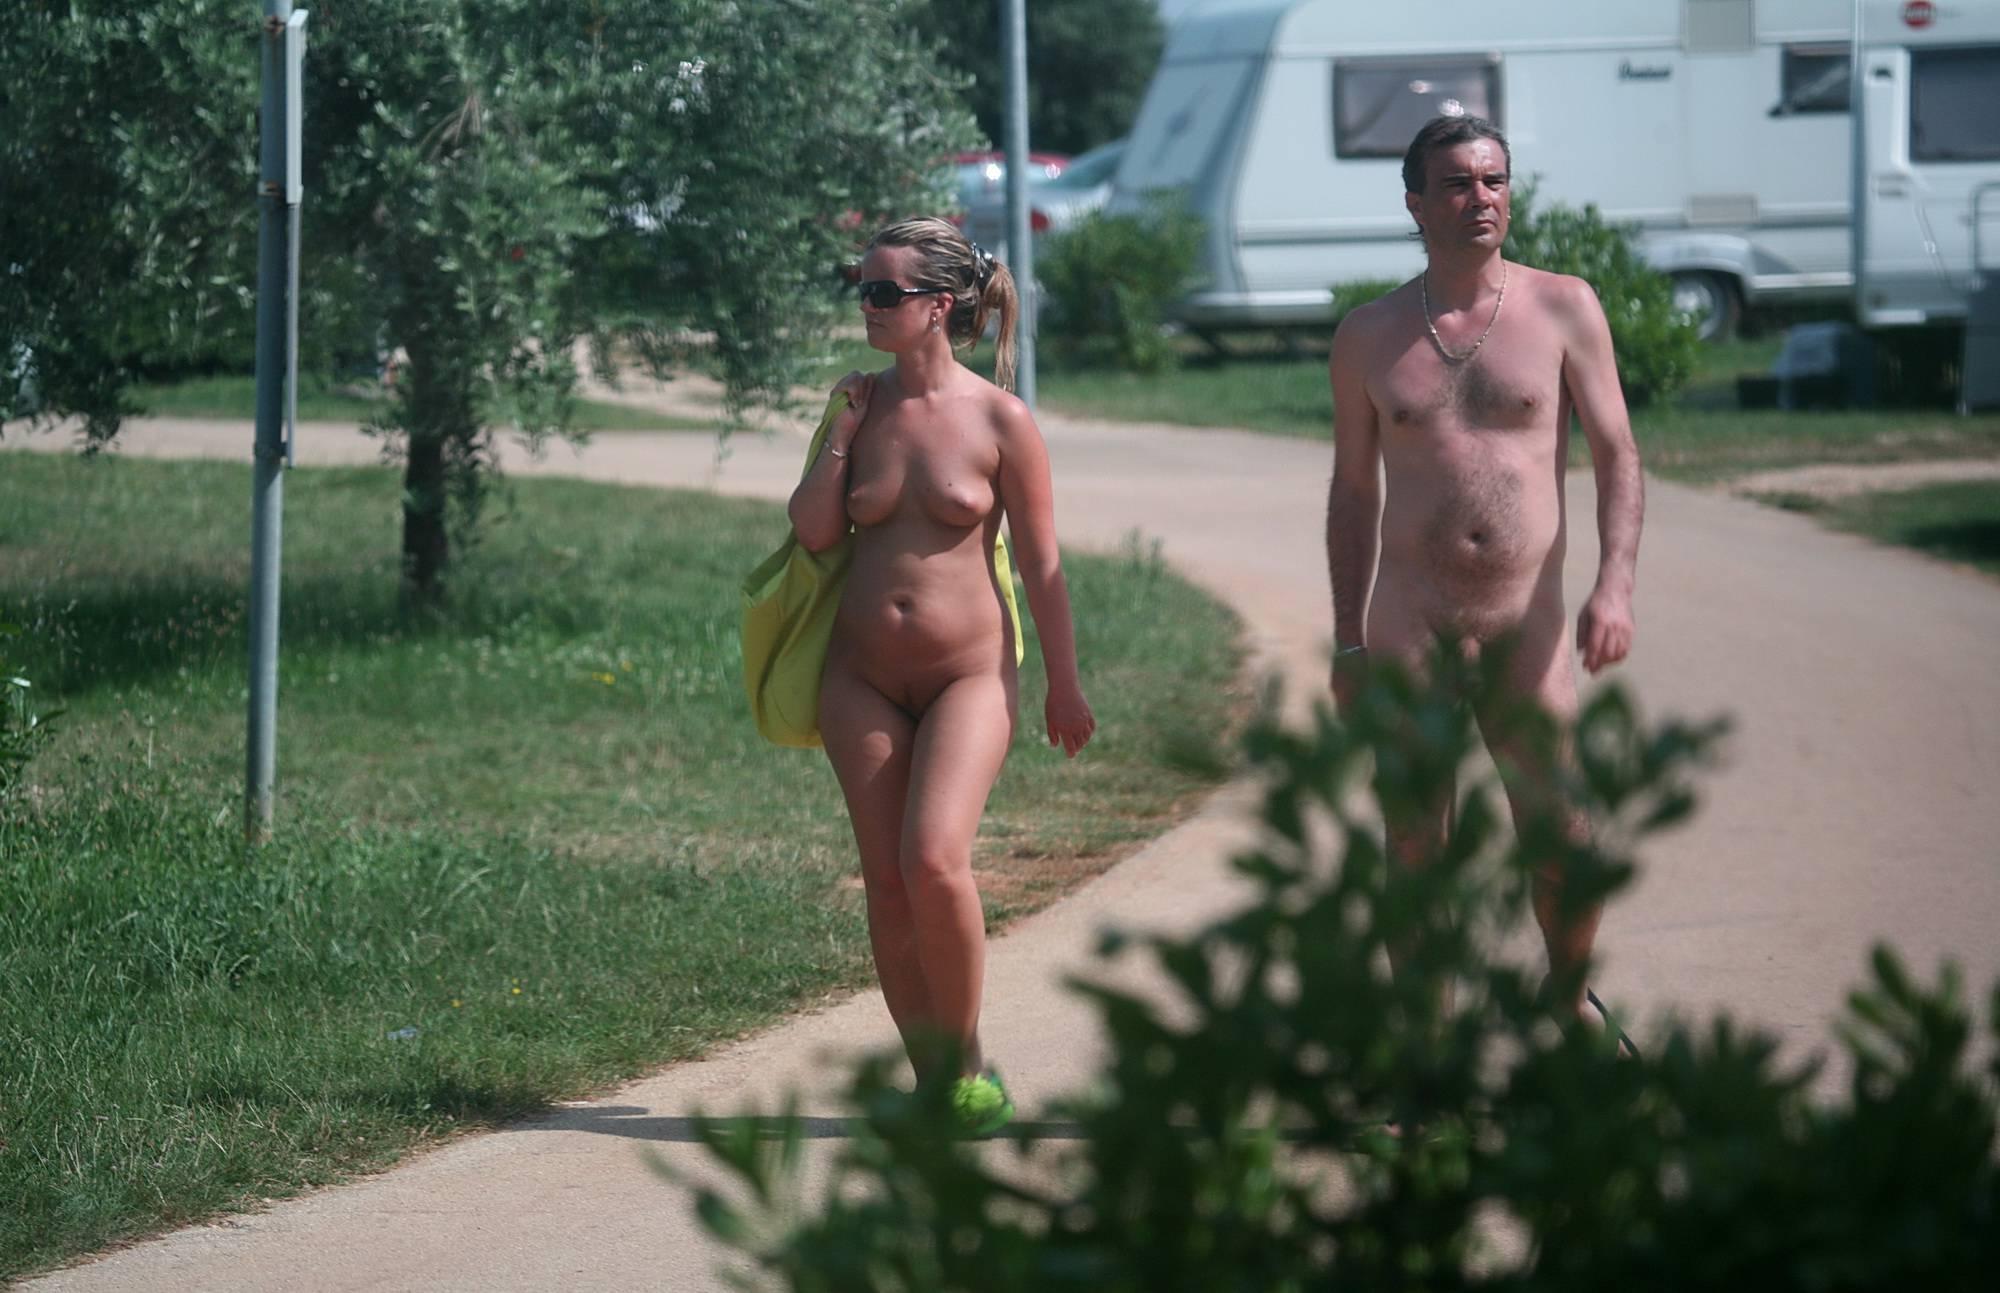 Naturist Sidewalk Stroll - 2